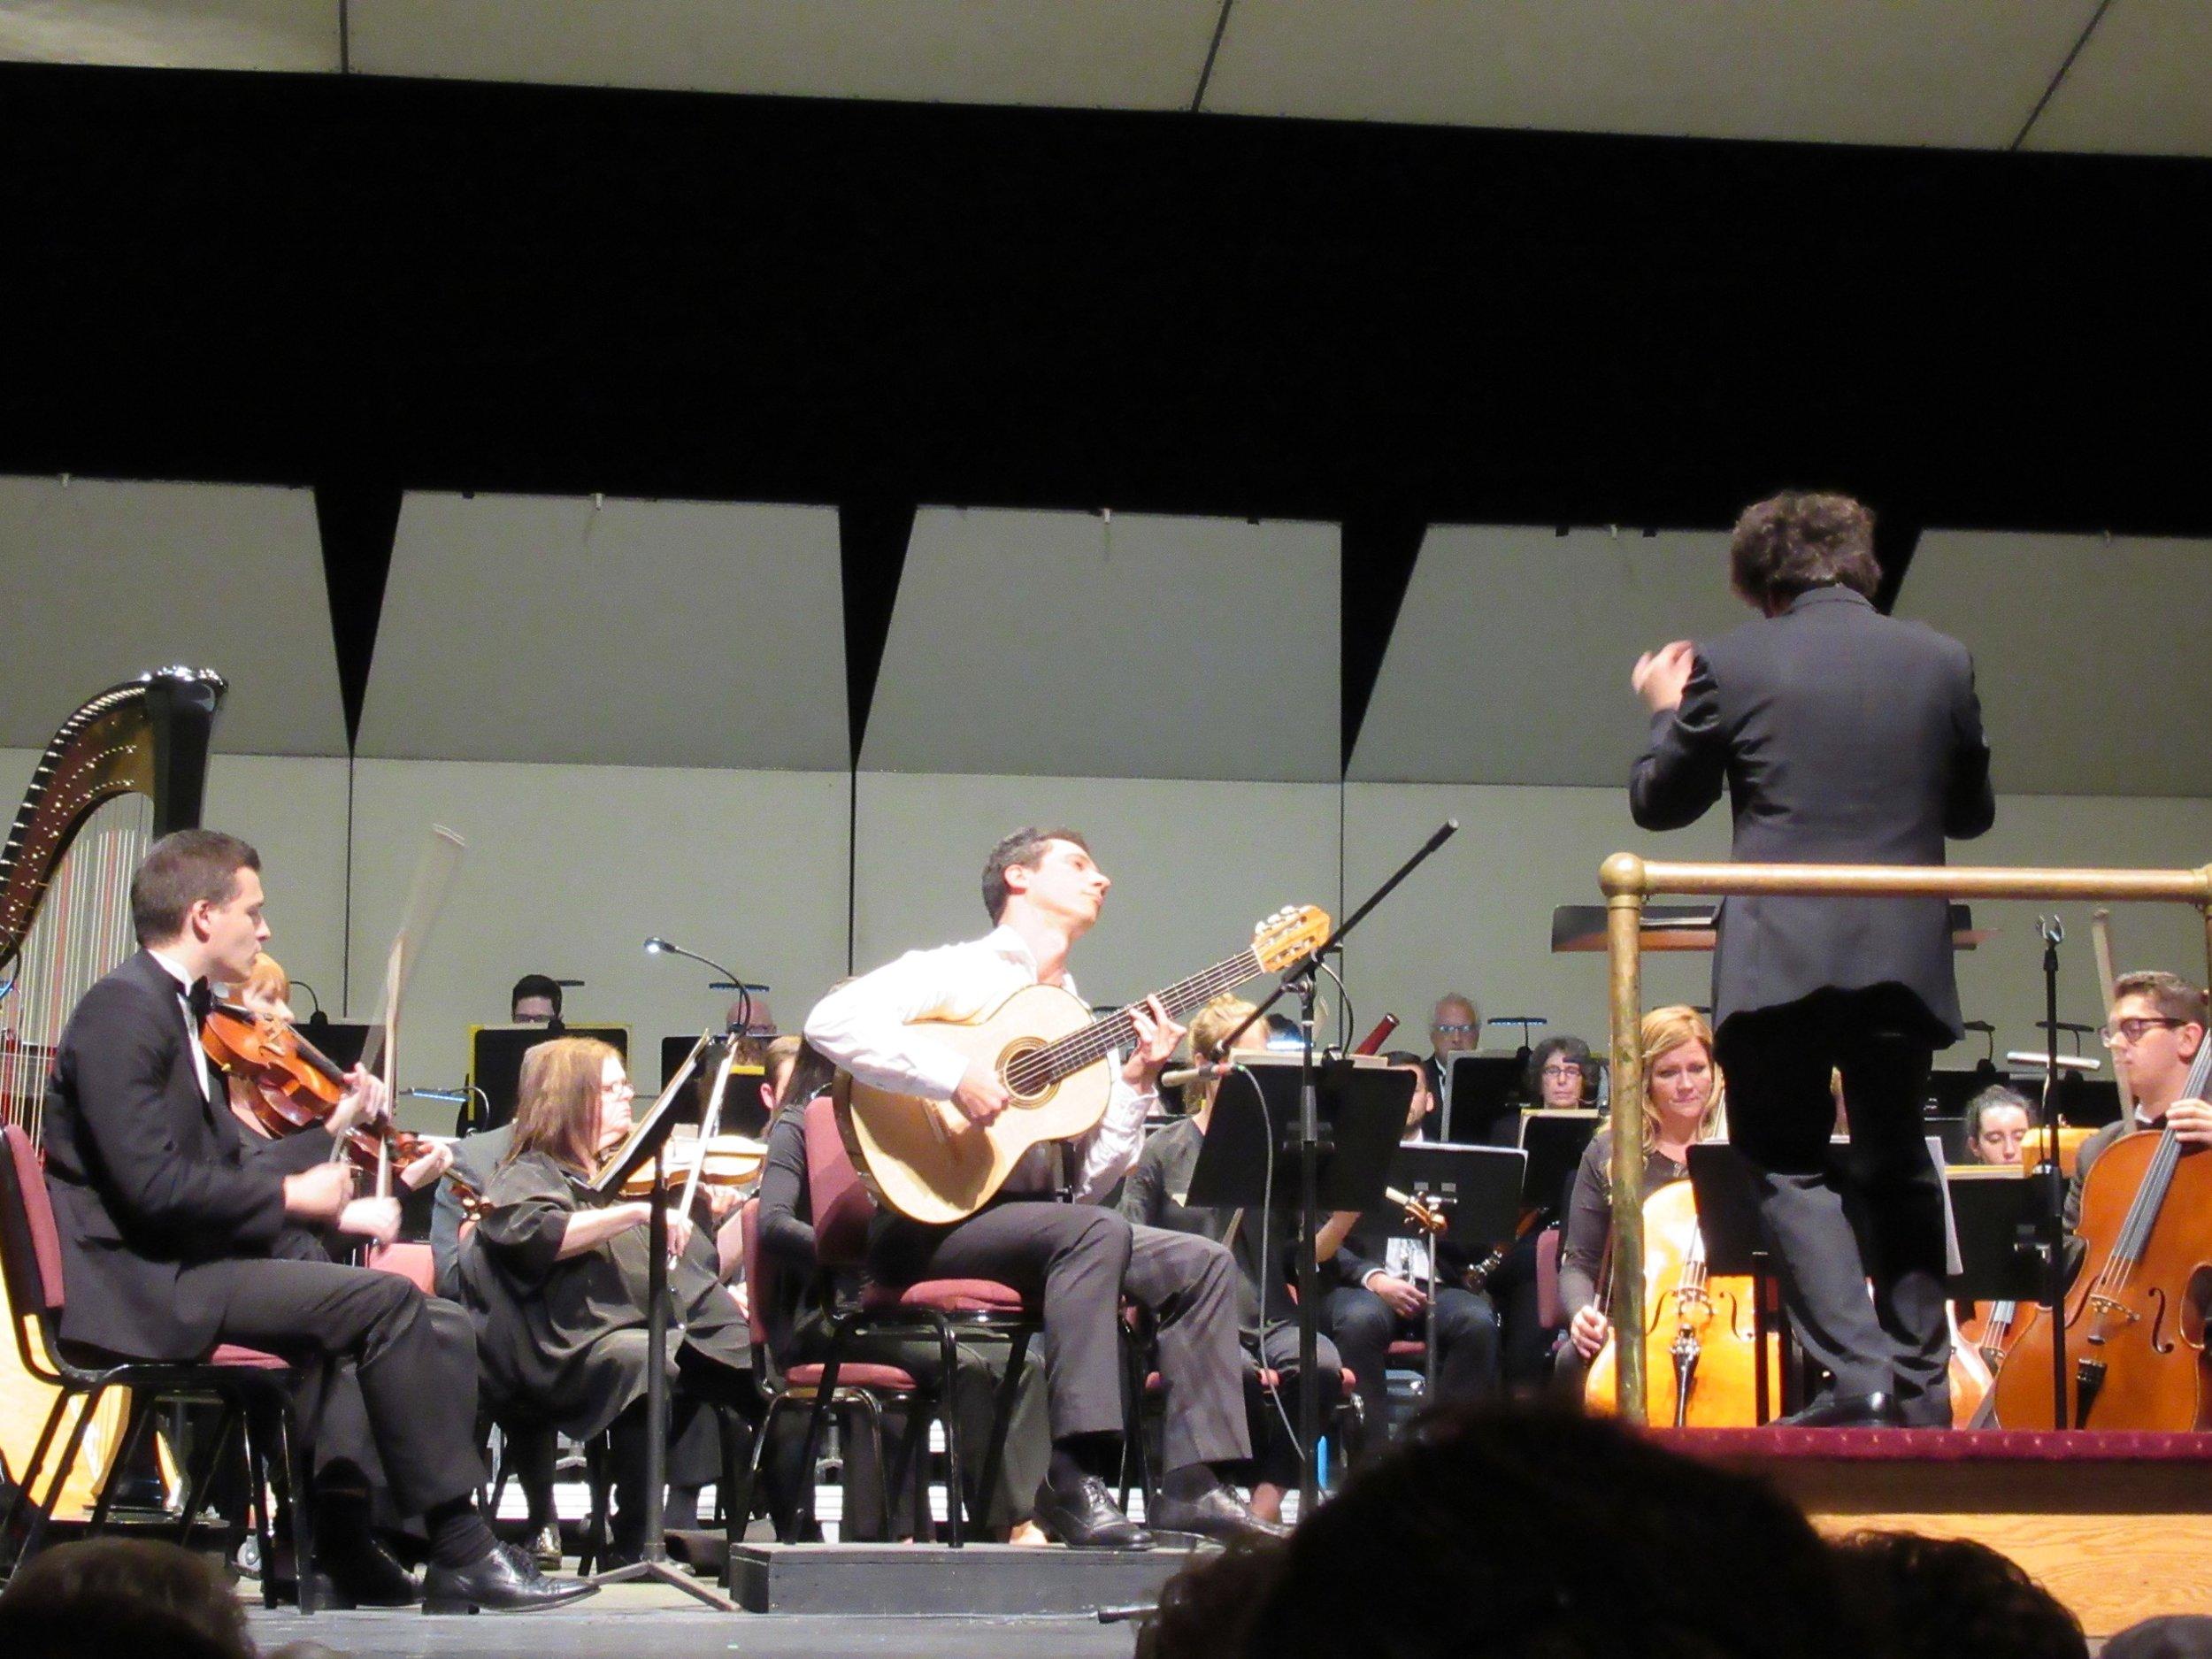 Grisha Goryachev plays Rodrigo's Concierto d'Aranjuez with the Mansfield Symphony and Octavio Más-Arocas at the podium.